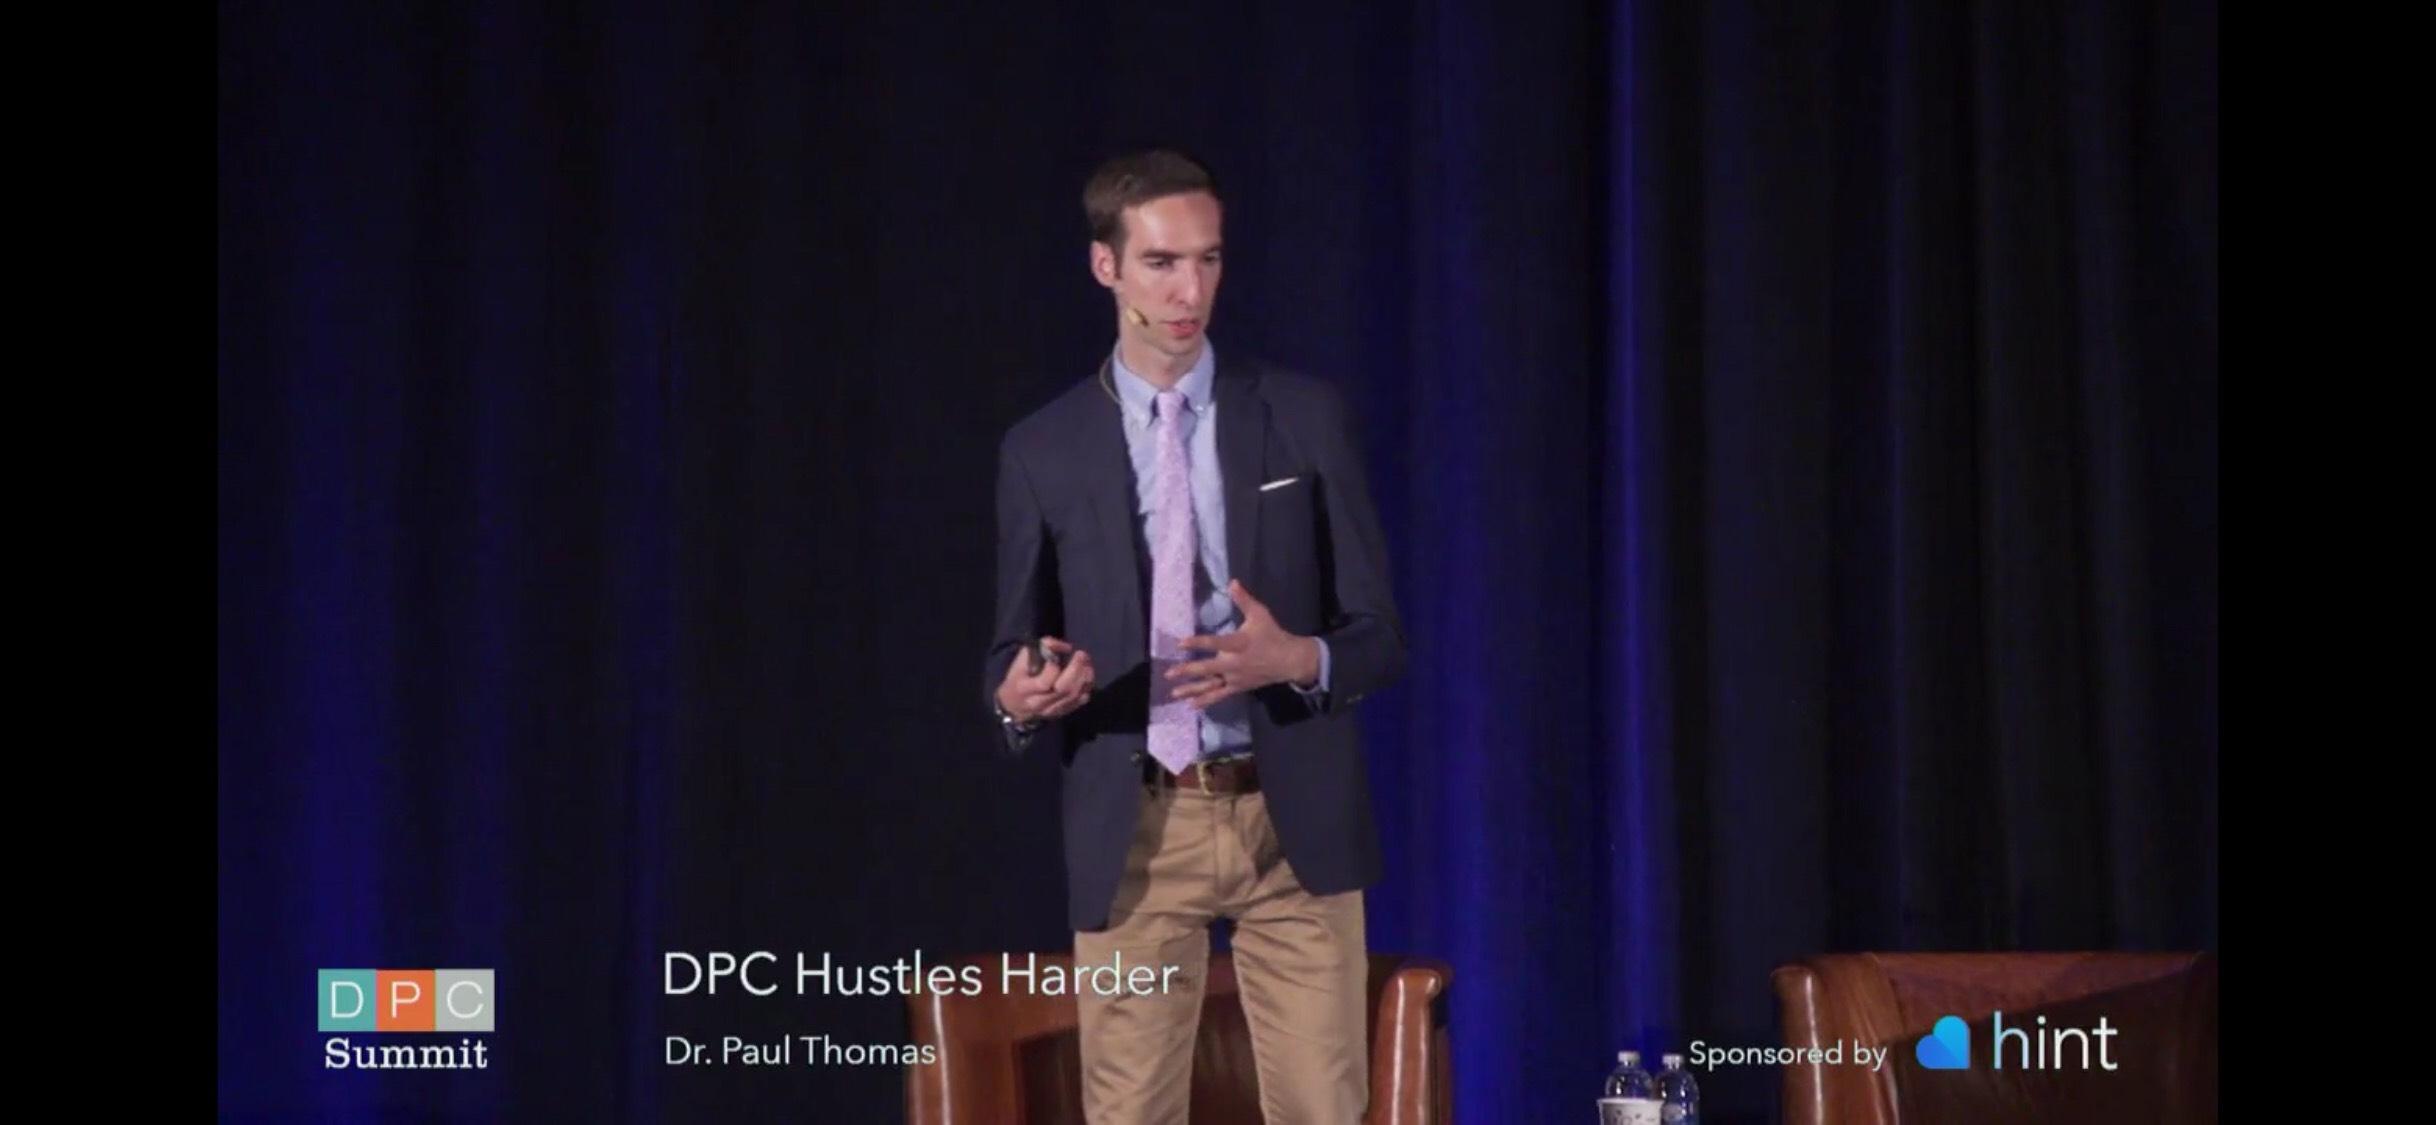 2018.07.15 AAFP DPC Summit 2018 DPC Hustles Harder with Dr. Paul Thomas.jpg